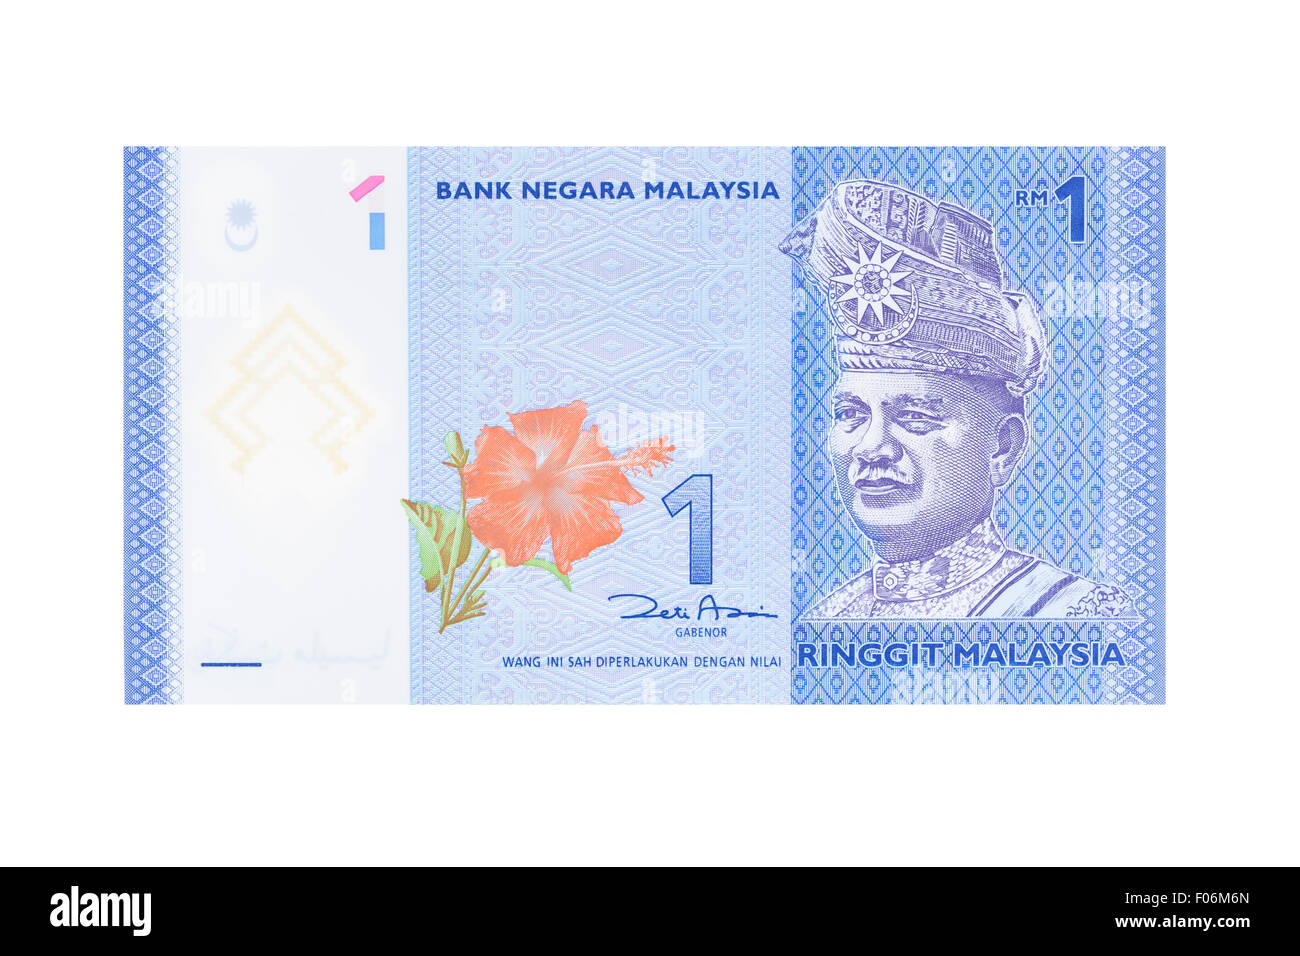 MYR Banknote 1 Malaysian Ringgit